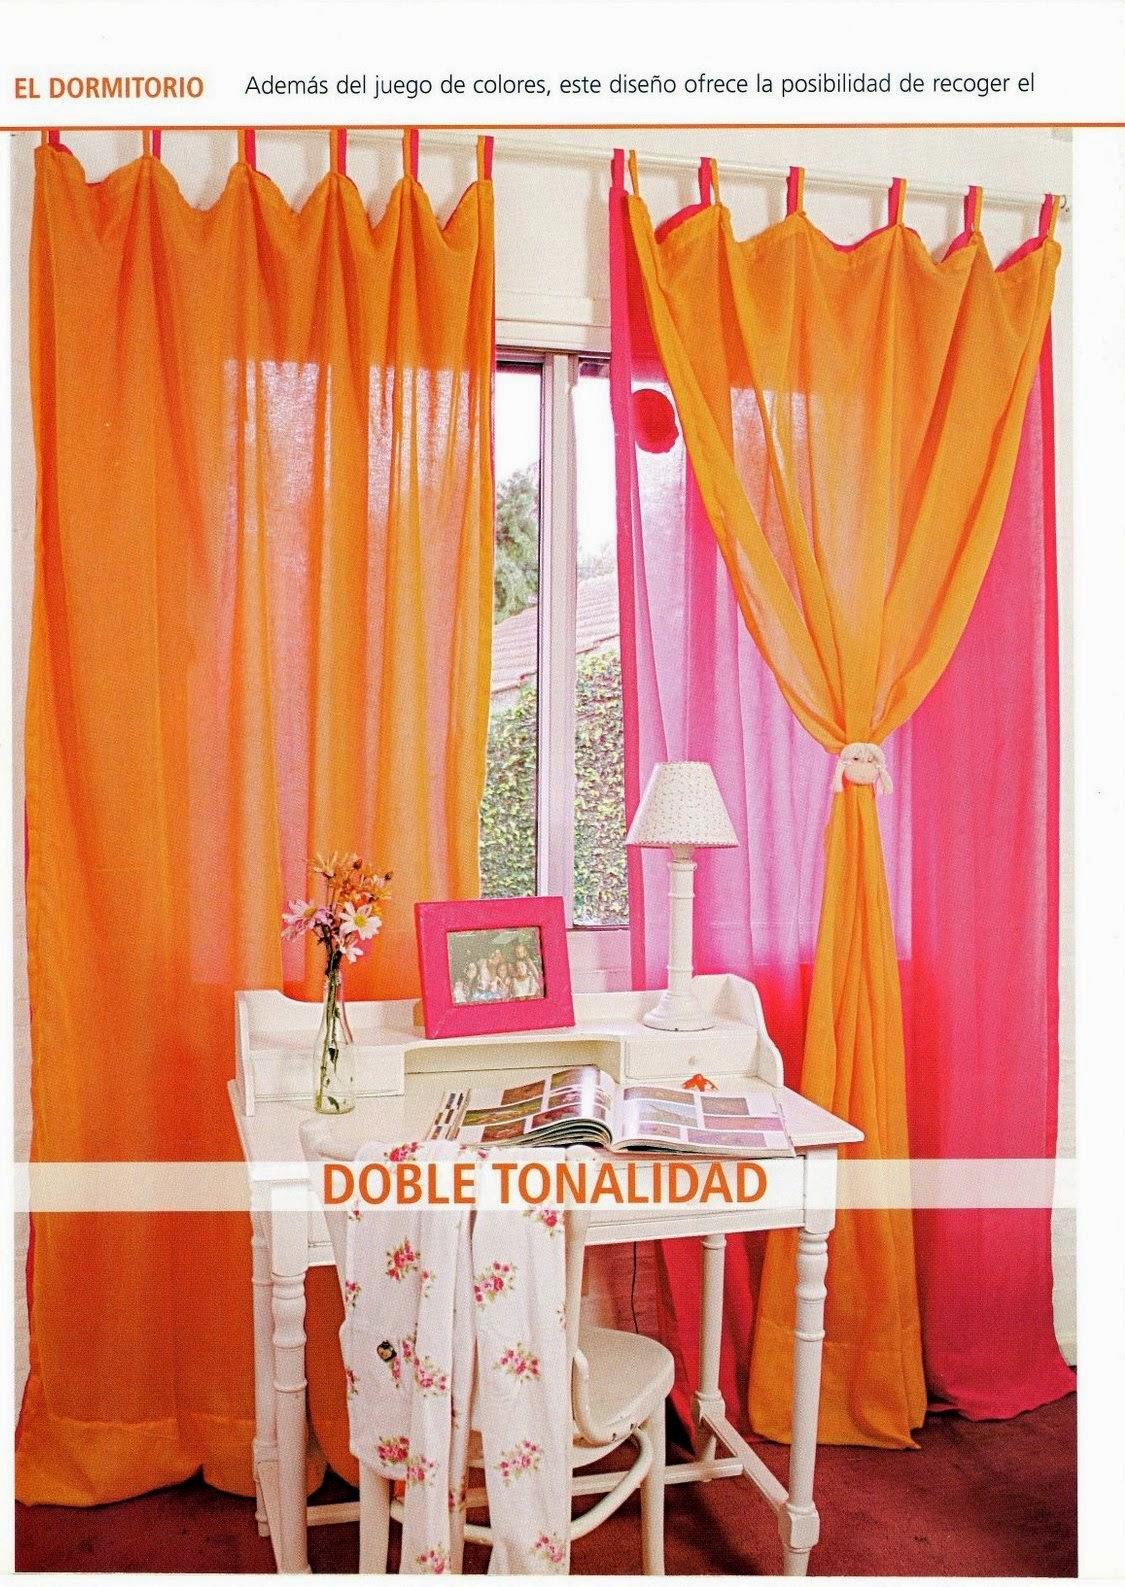 Como hacer cortinas paso a paso revistas de manualidades for Hacer cortinas cocina